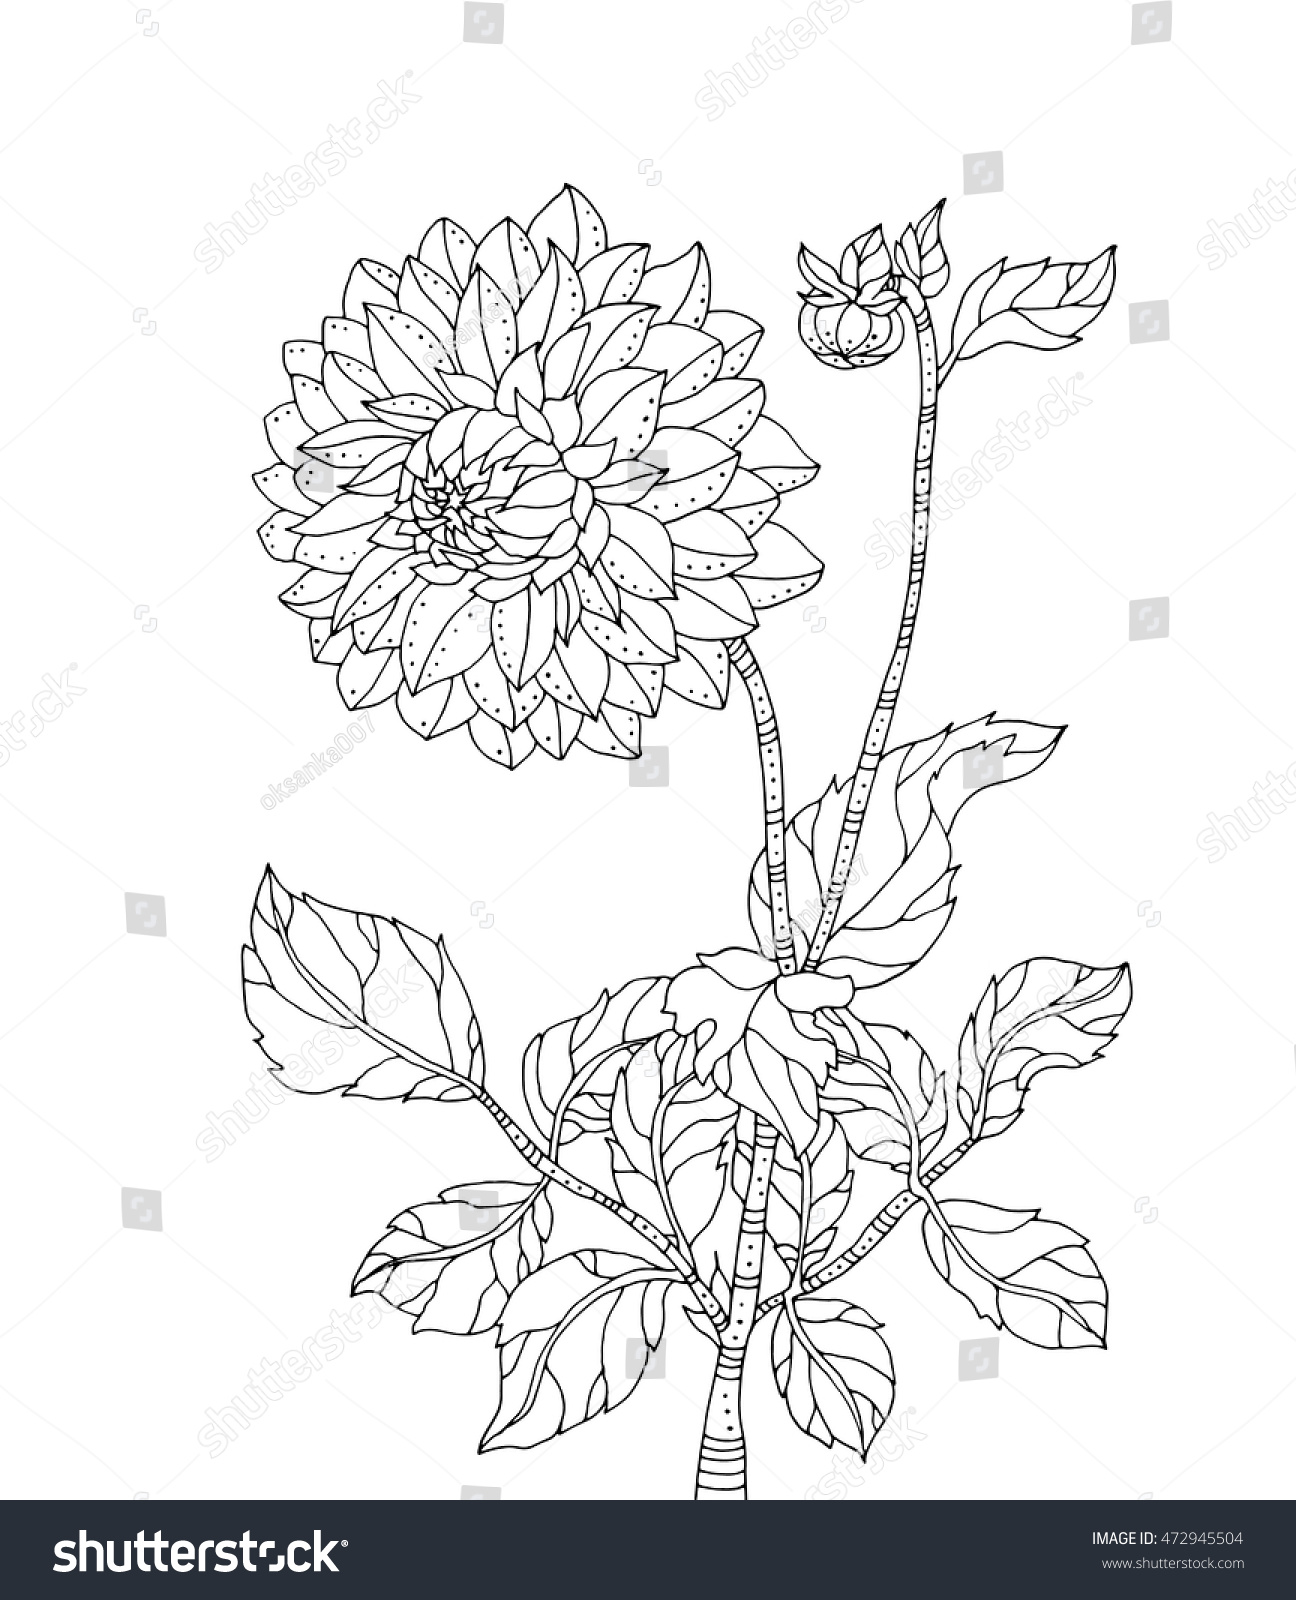 Chrysanthemum Flower Vector Artwork Coloring Book Stock Vector ...